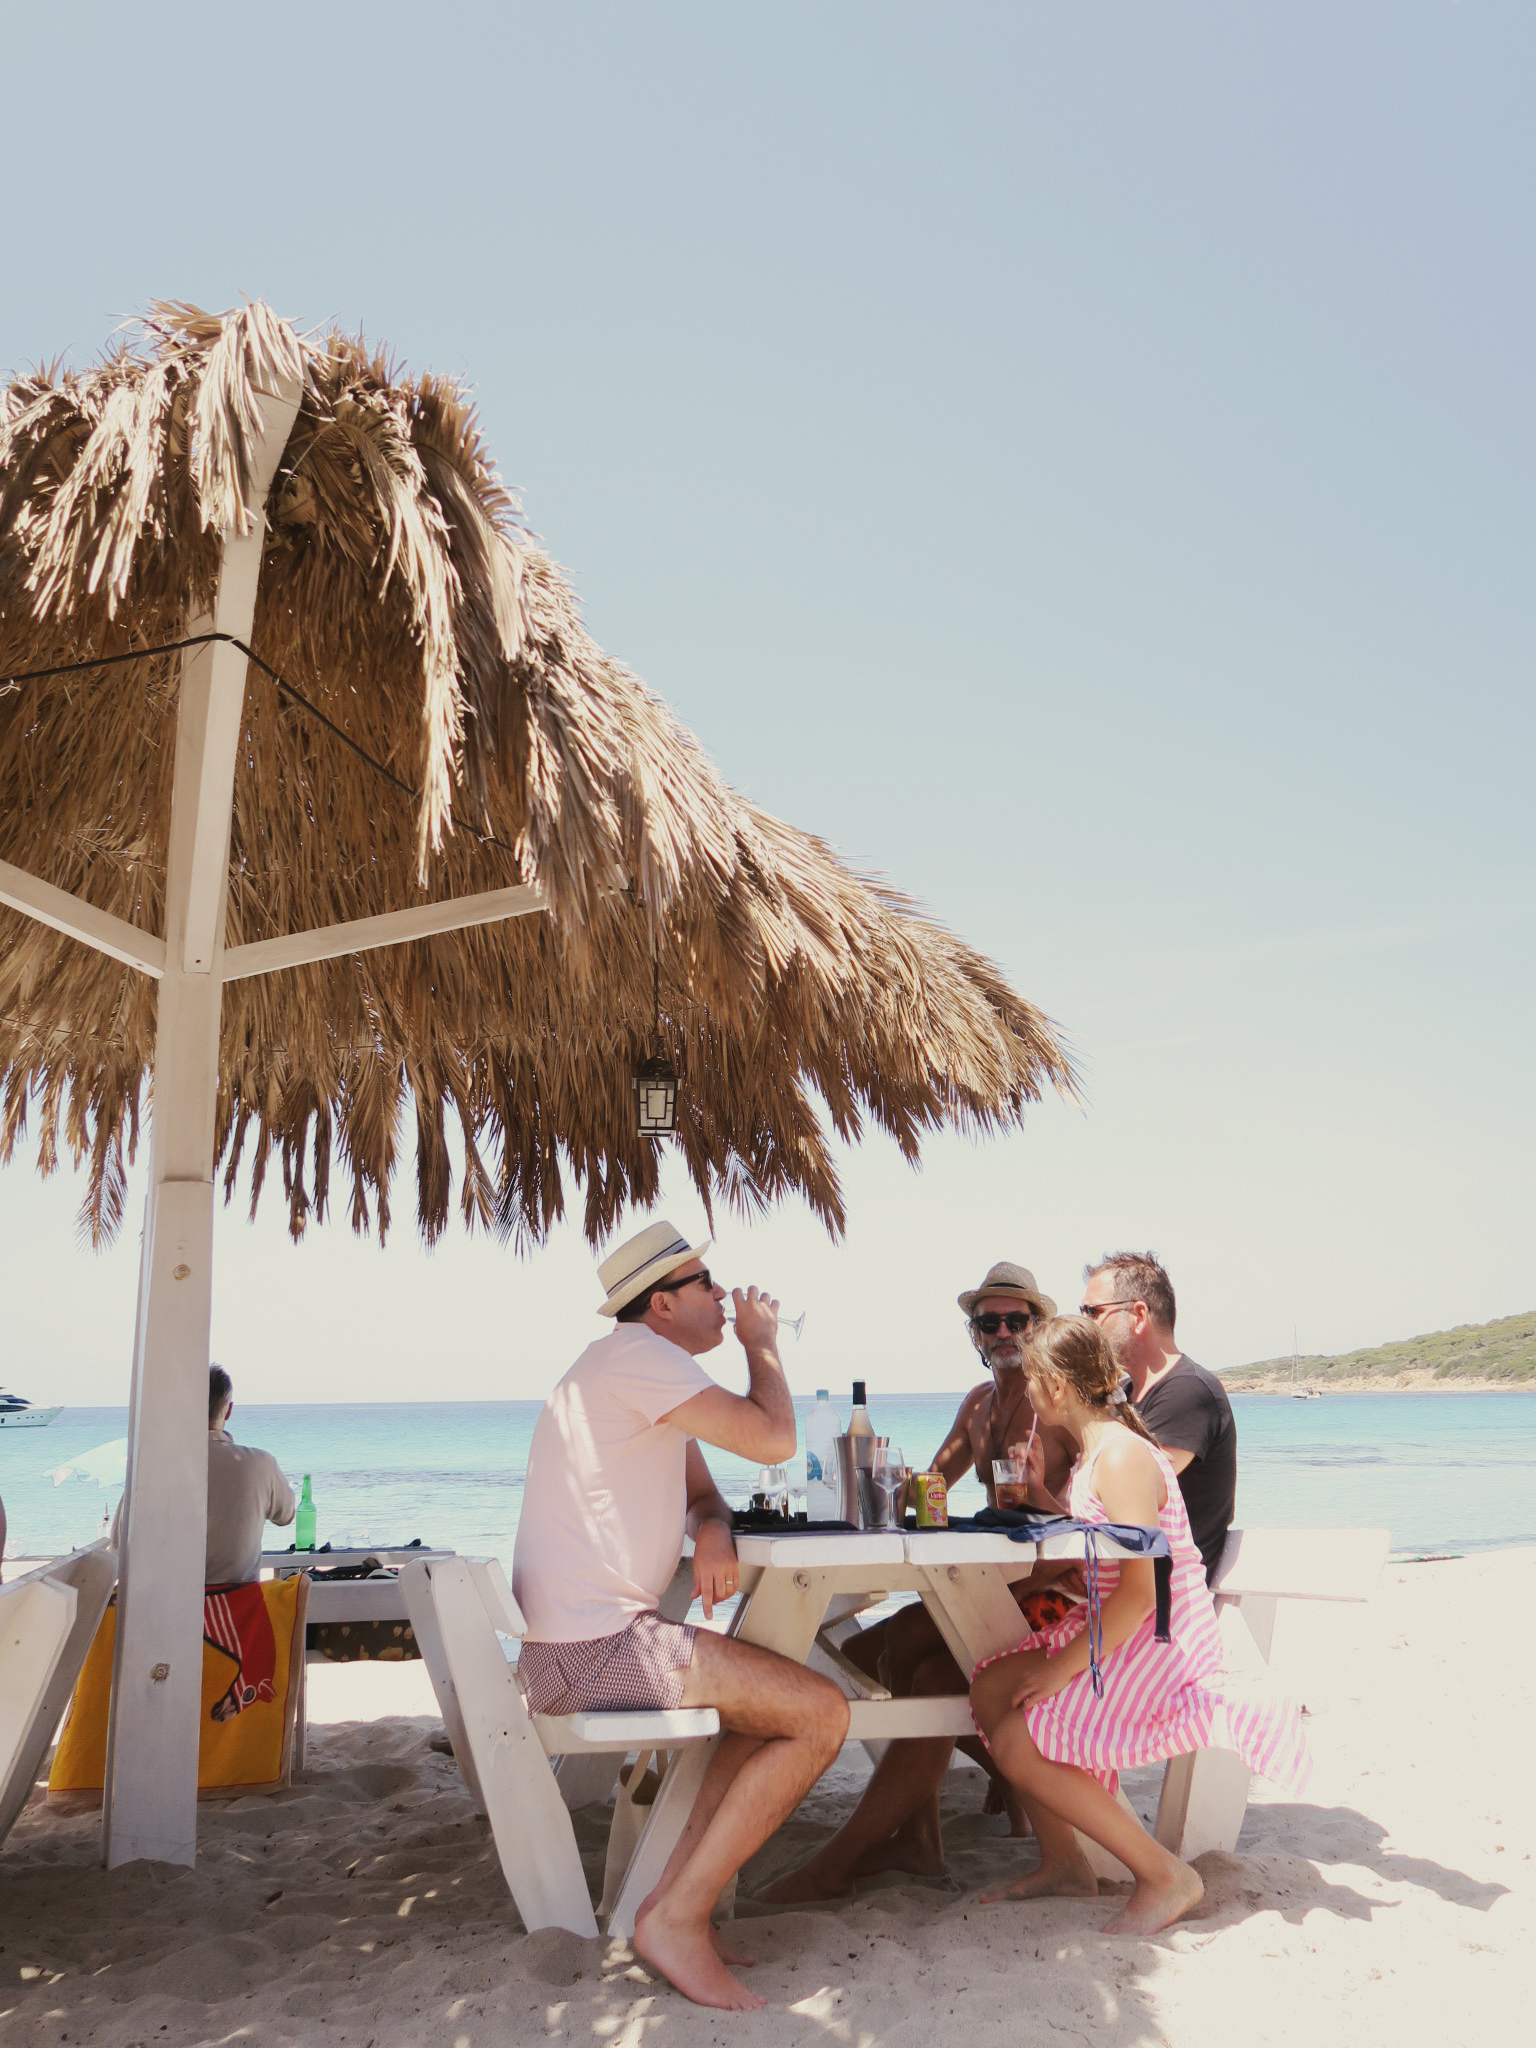 travellur_corsica_family_beach_life_relax_edit.jpg